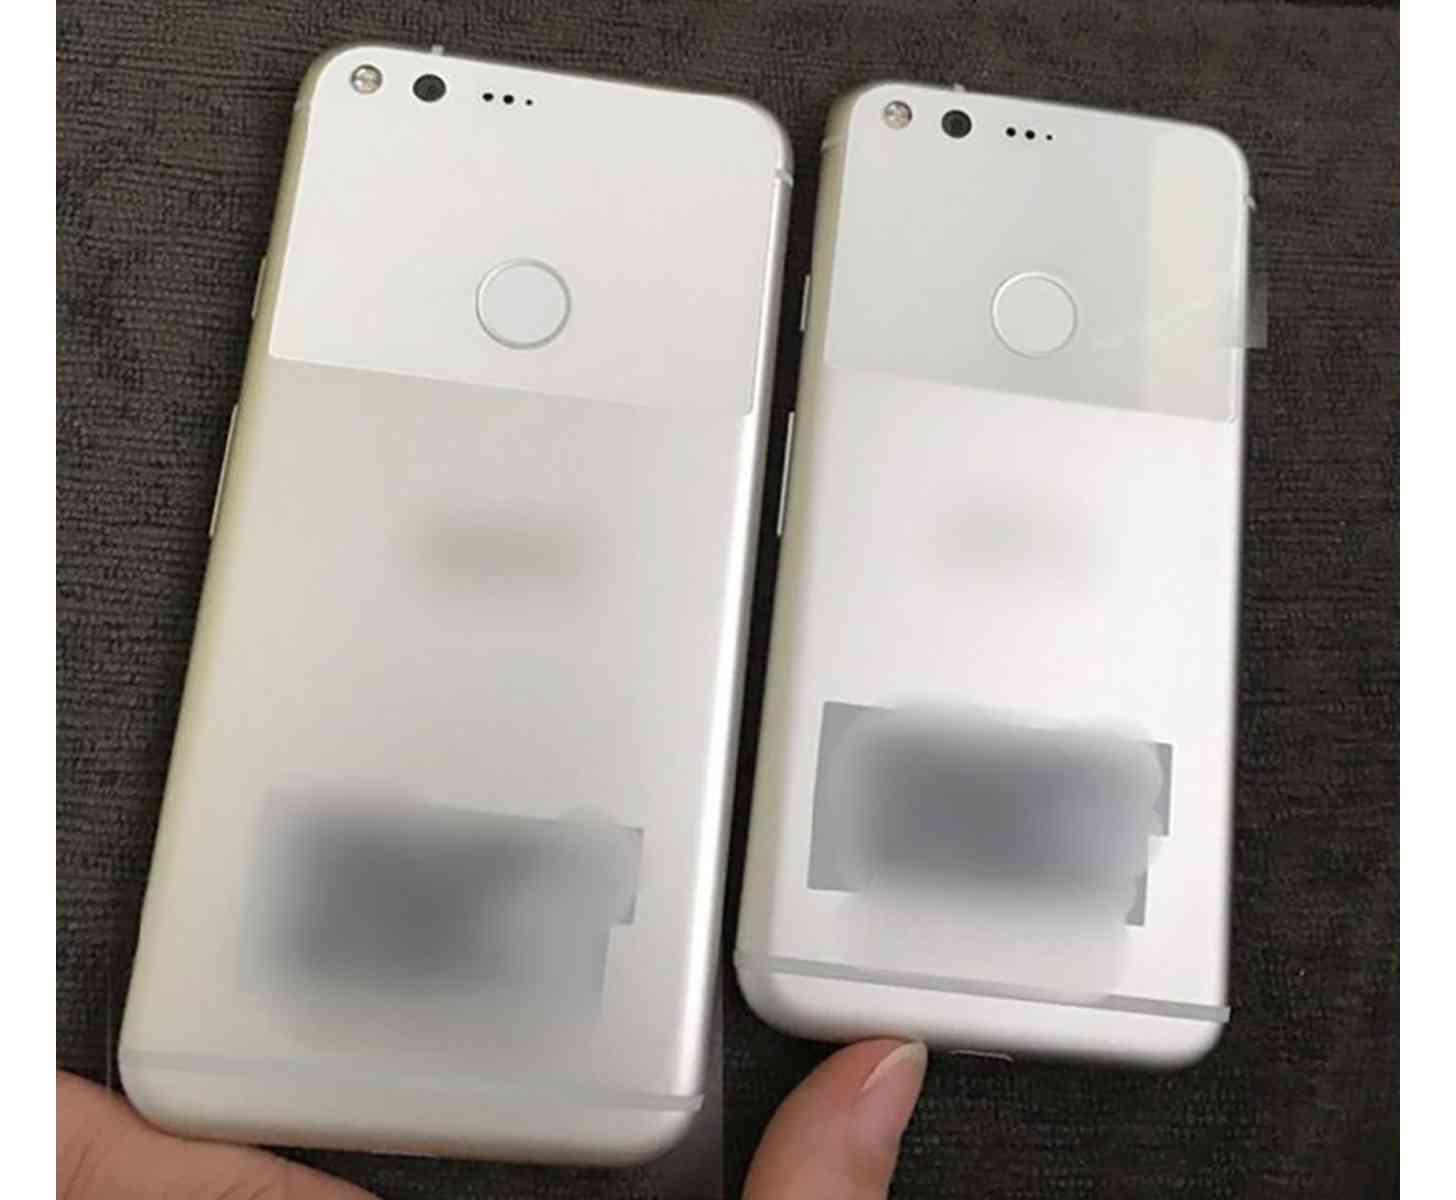 Google Pixel phones rear image leak